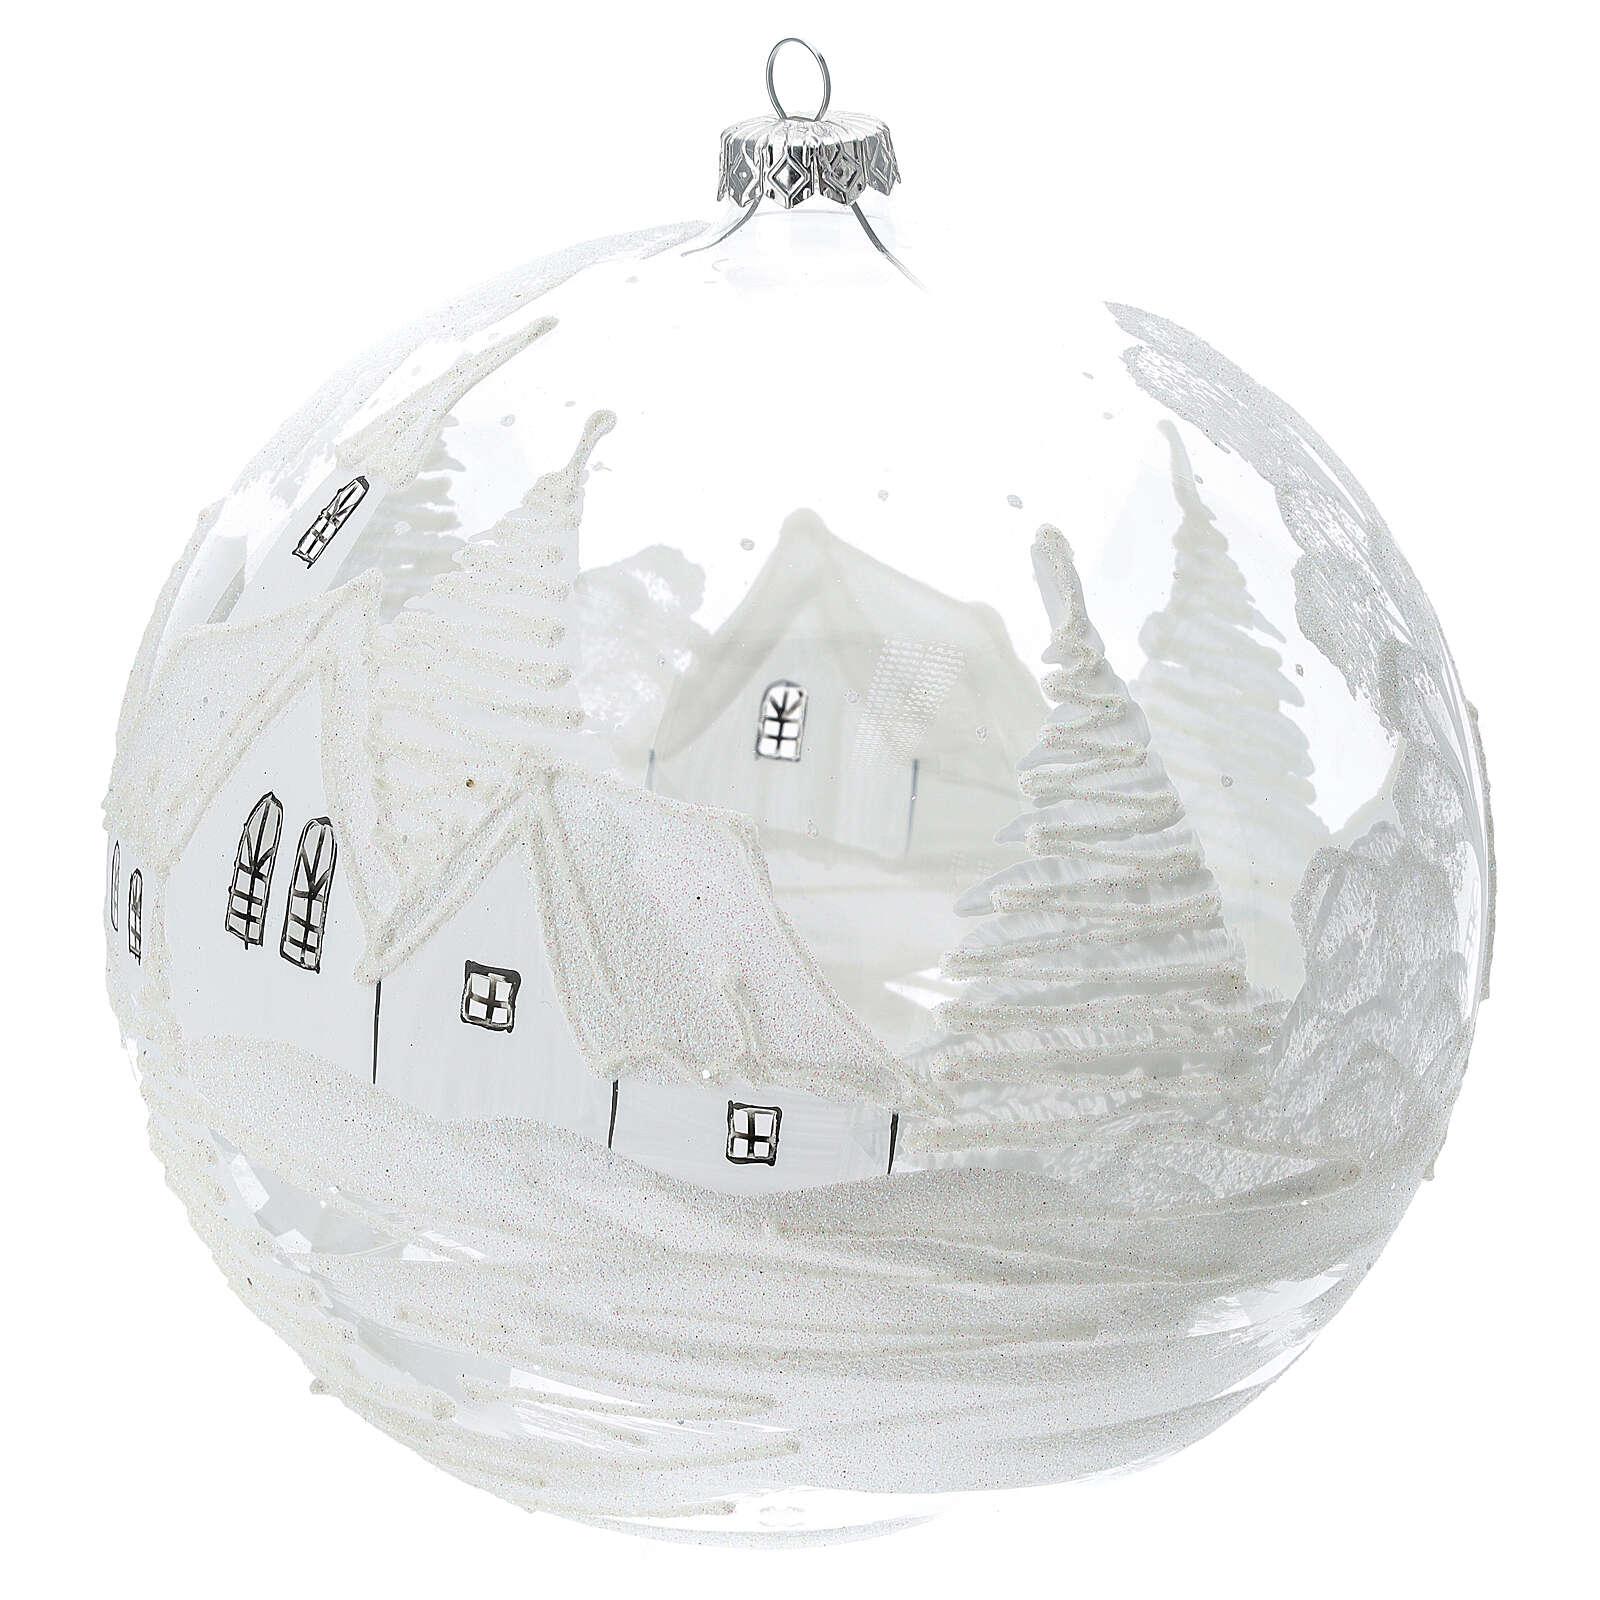 Pallina Natale bianca paesaggio neve vetro soffiato 200 mm 4